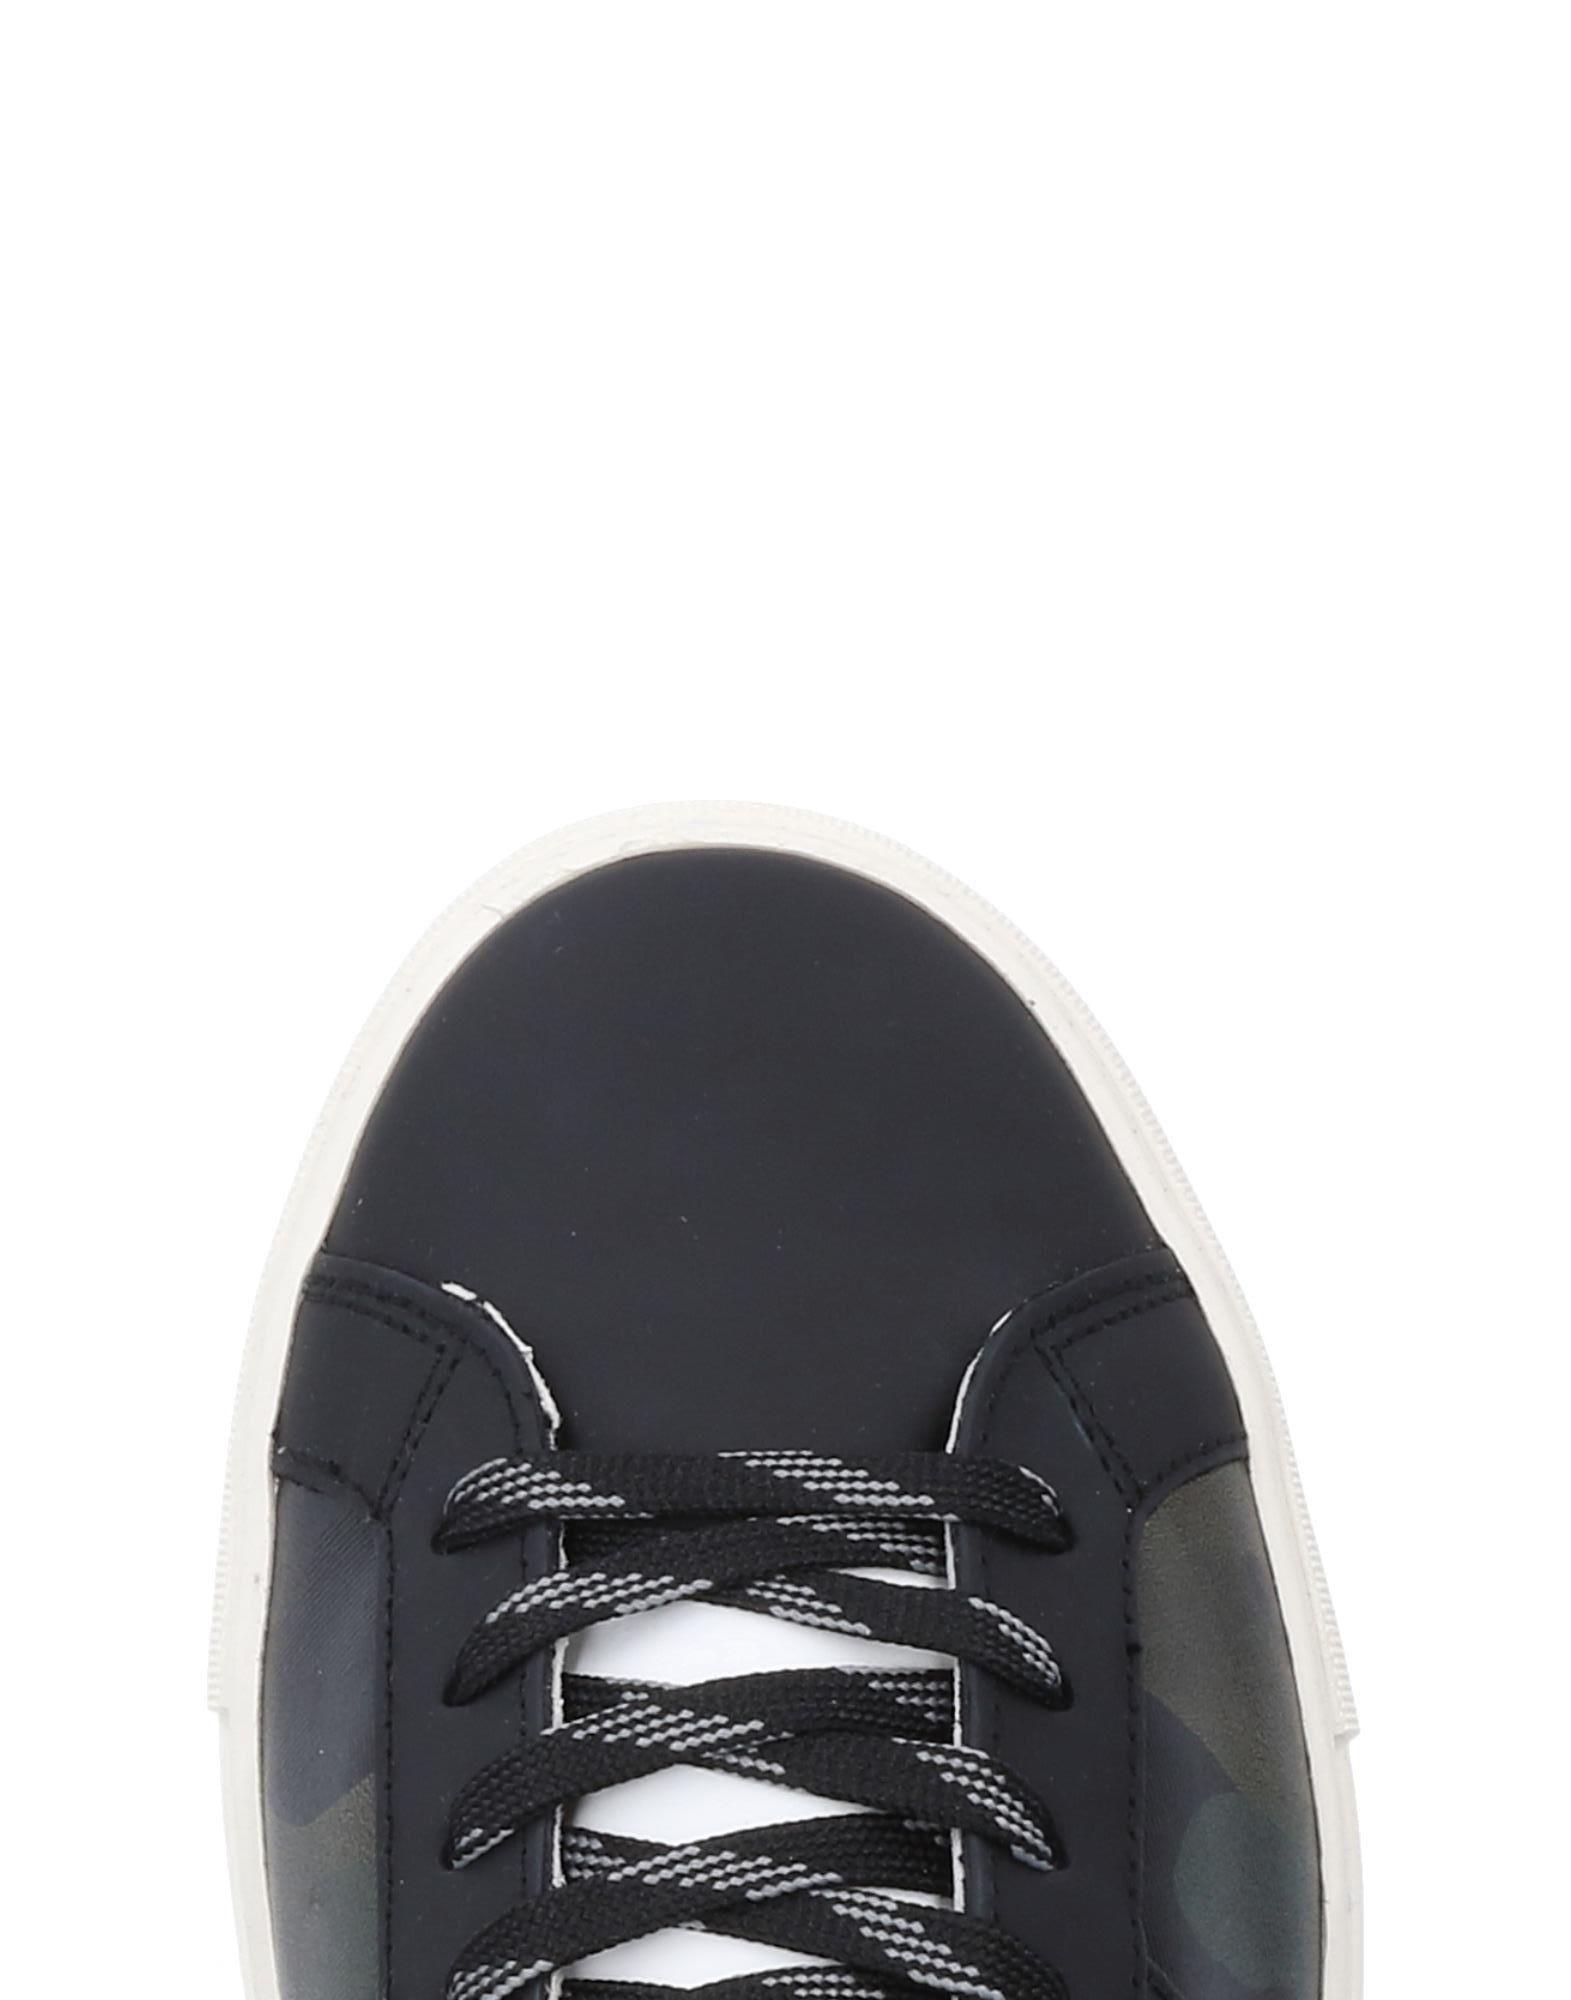 Rabatt echte Sneakers Schuhe D.A.T.E. Sneakers echte Herren  11510389UV cab7b3